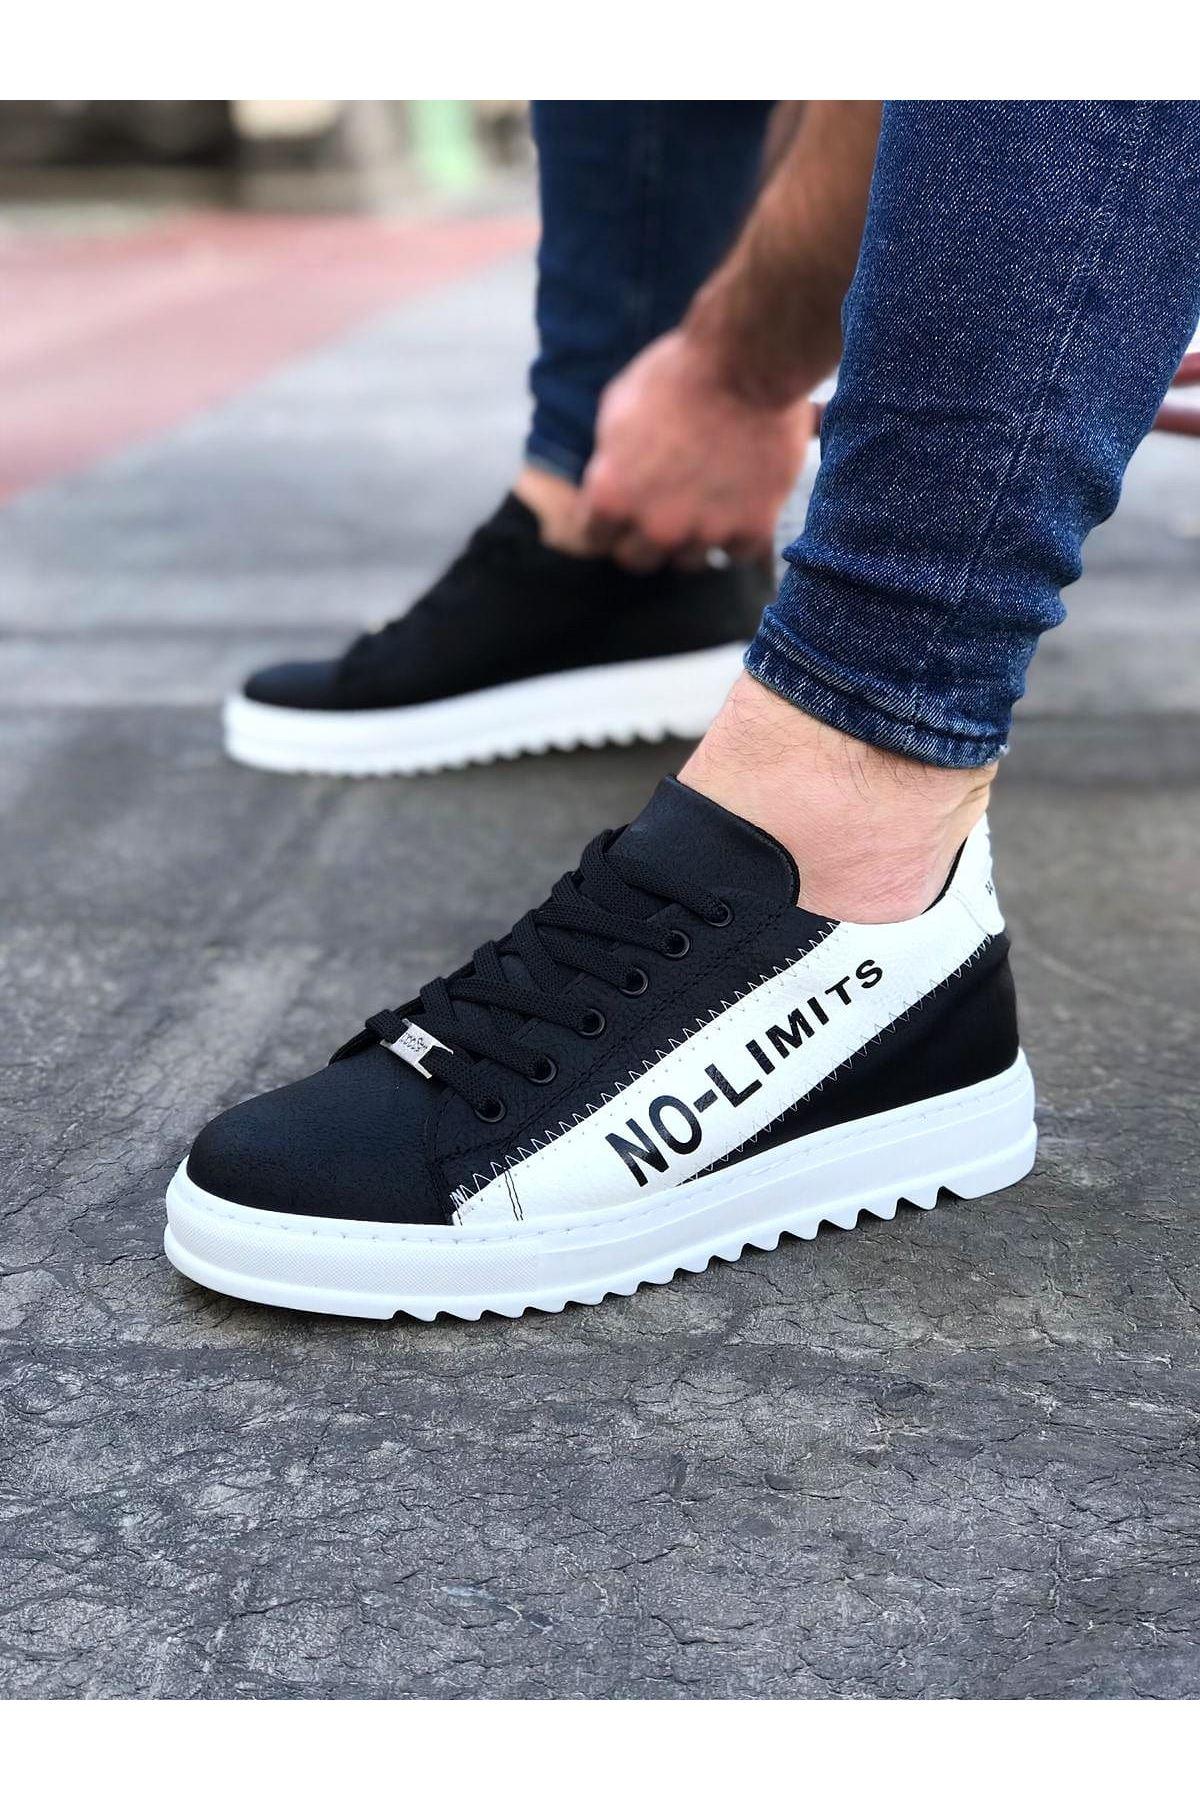 Wagoon WG027 Siyah Beyaz No Limit Erkek Casual Ayakkabı